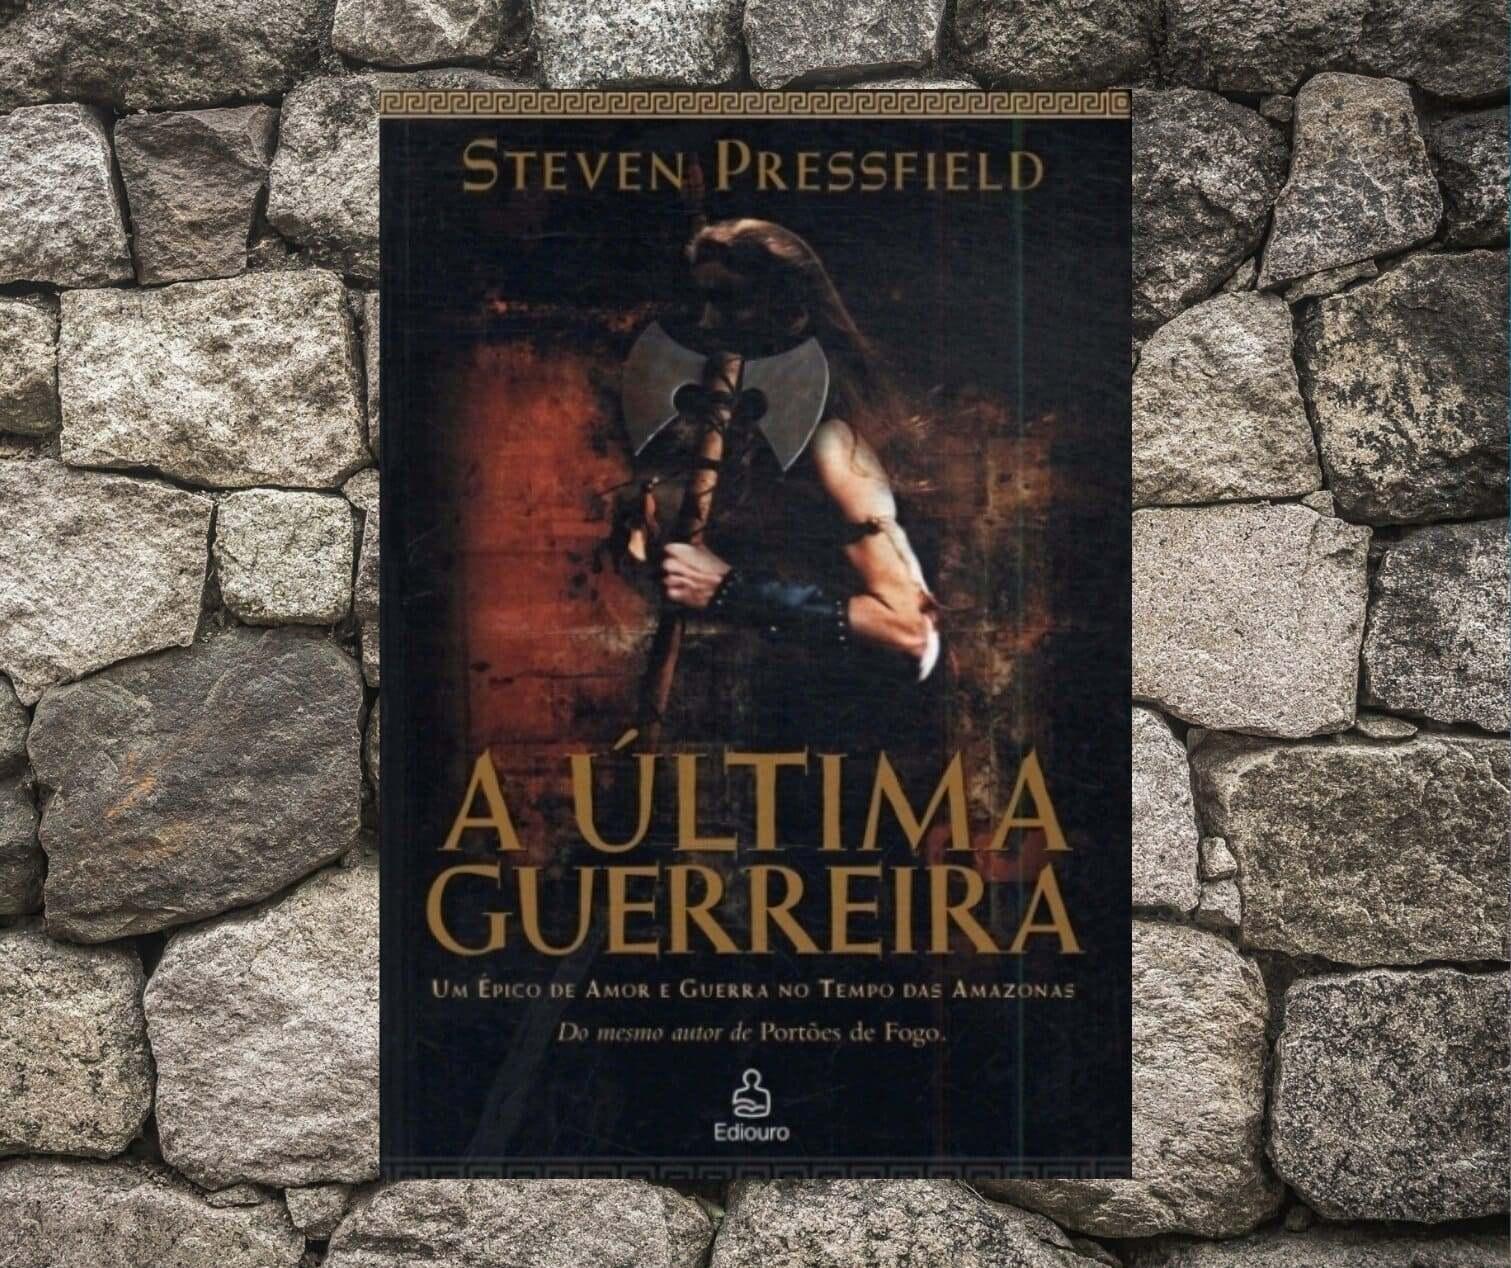 Resenha: A última guerreira, de Steven Pressfield